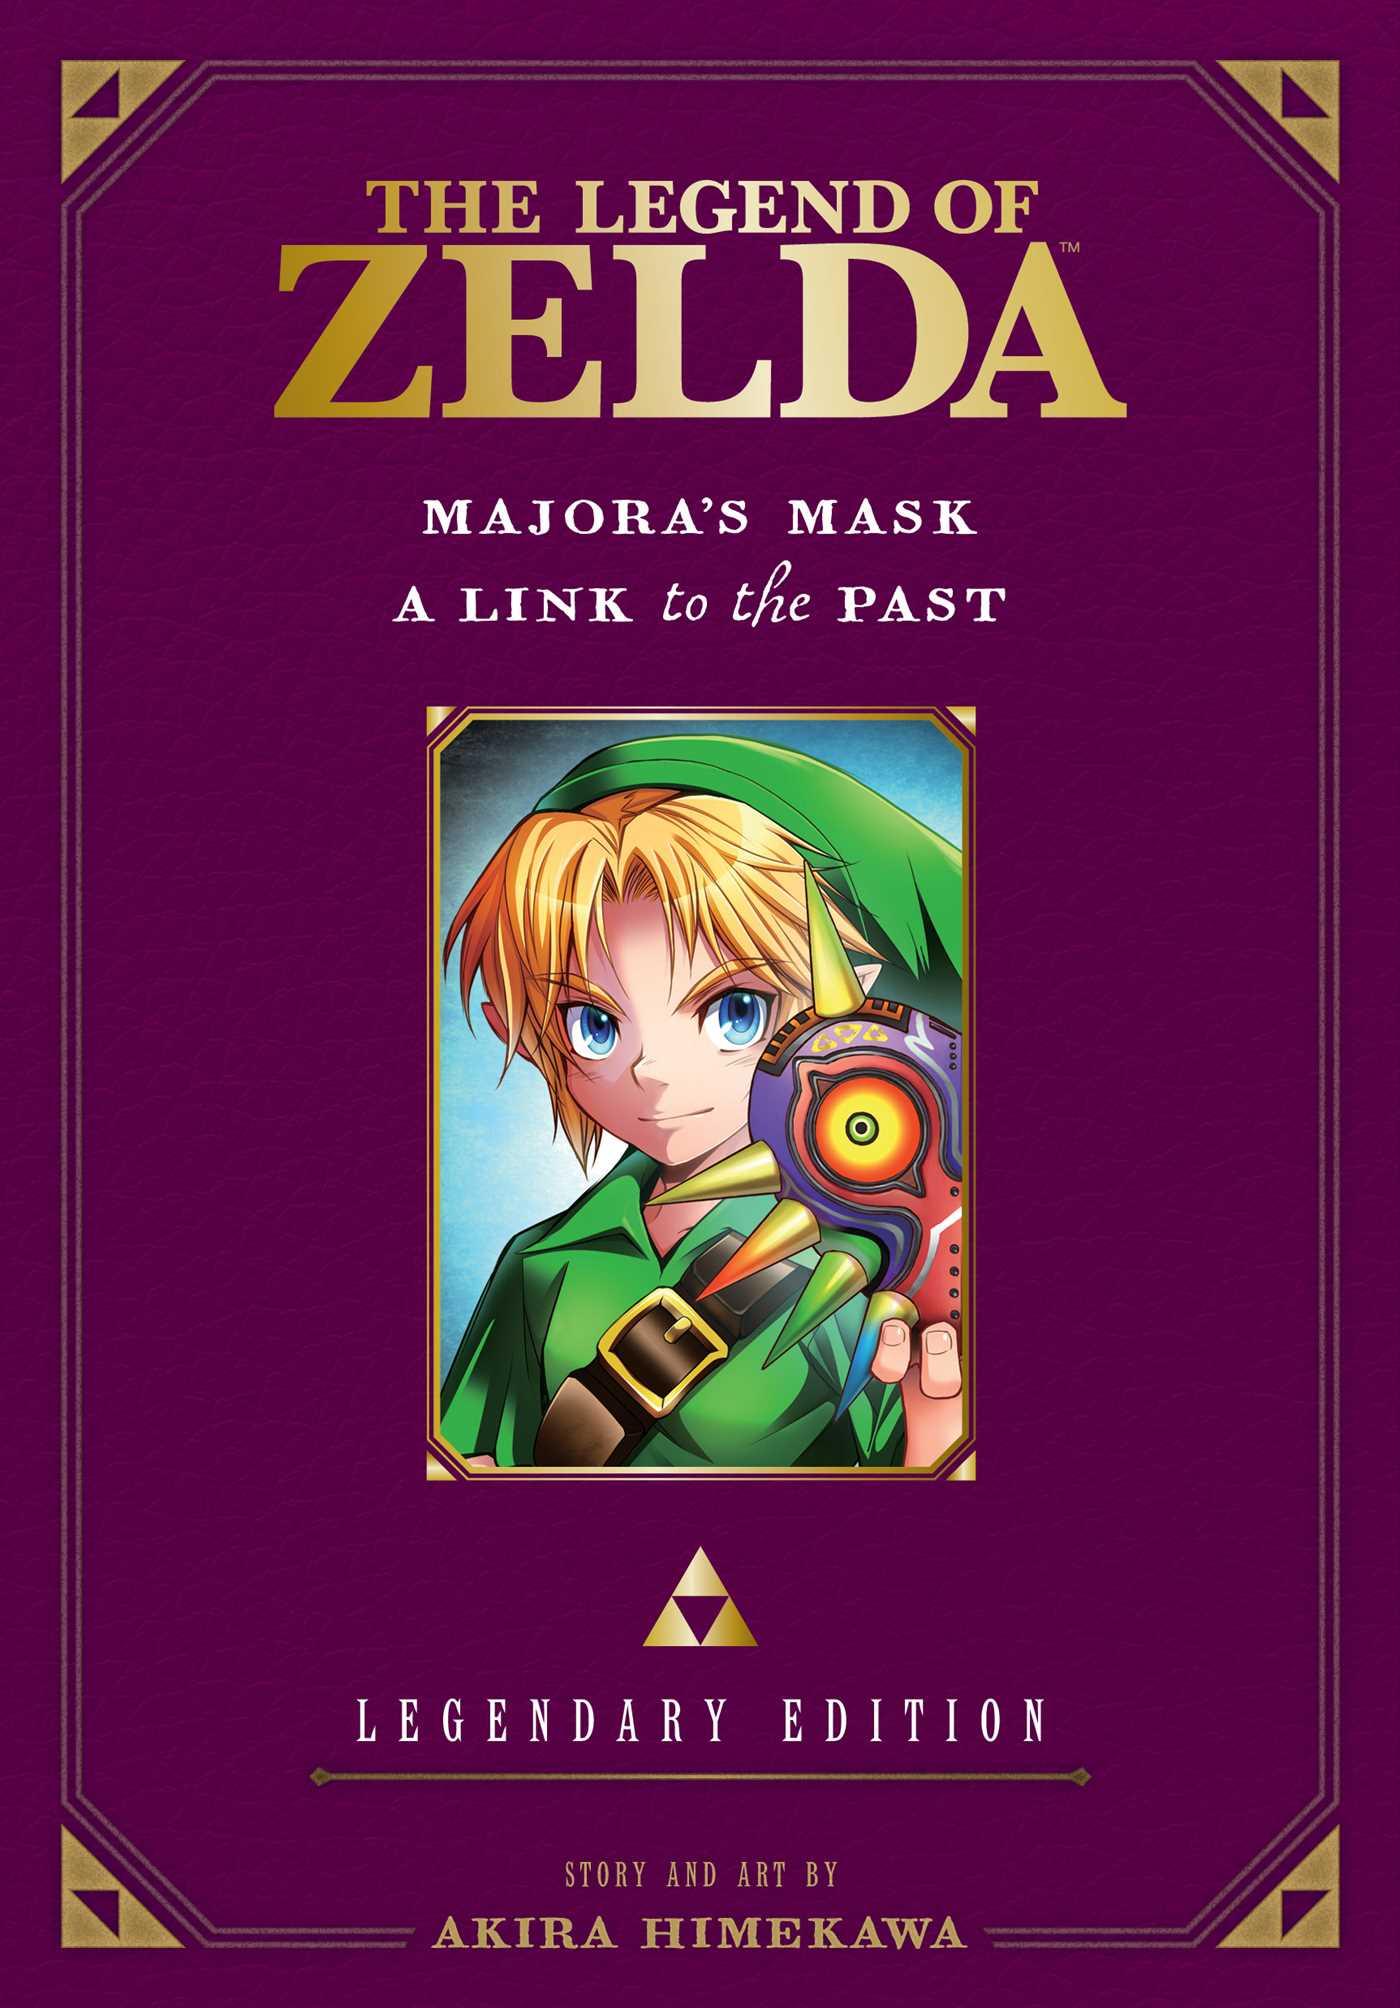 The Legend of Zelda Legendary Edition Manga Volume 3 9781421589619